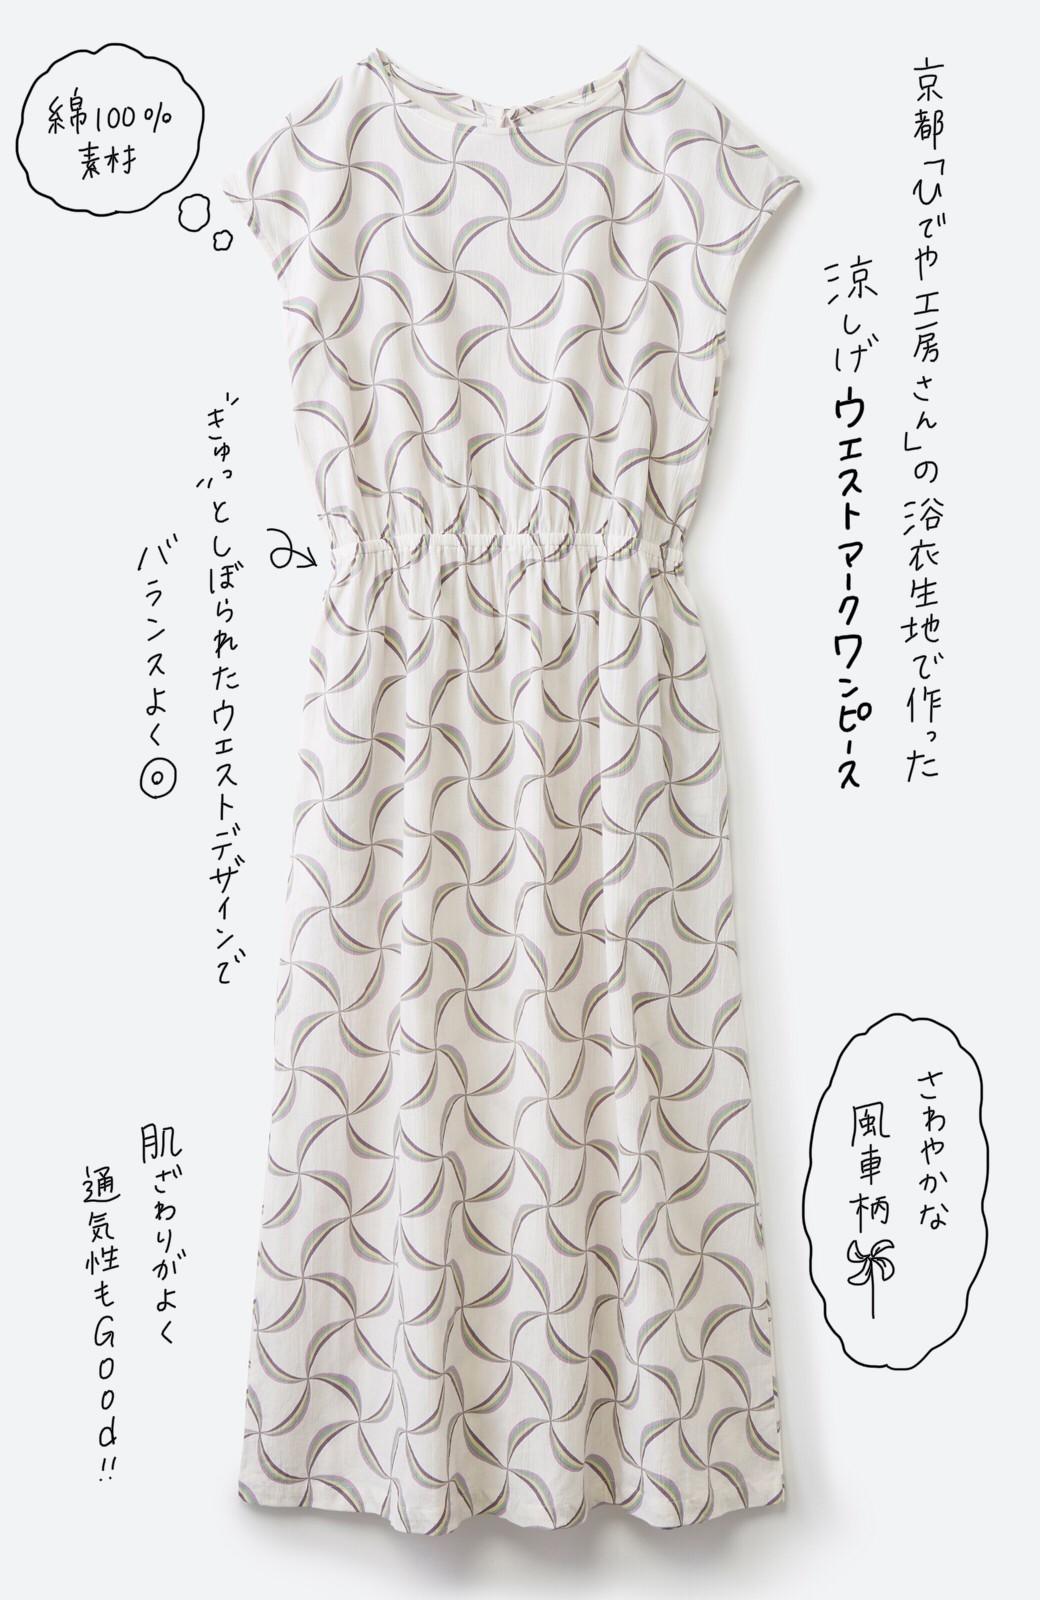 haco! 京都の浴衣屋さんと作った浴衣生地のウエストマークワンピース <ホワイト系その他>の商品写真2